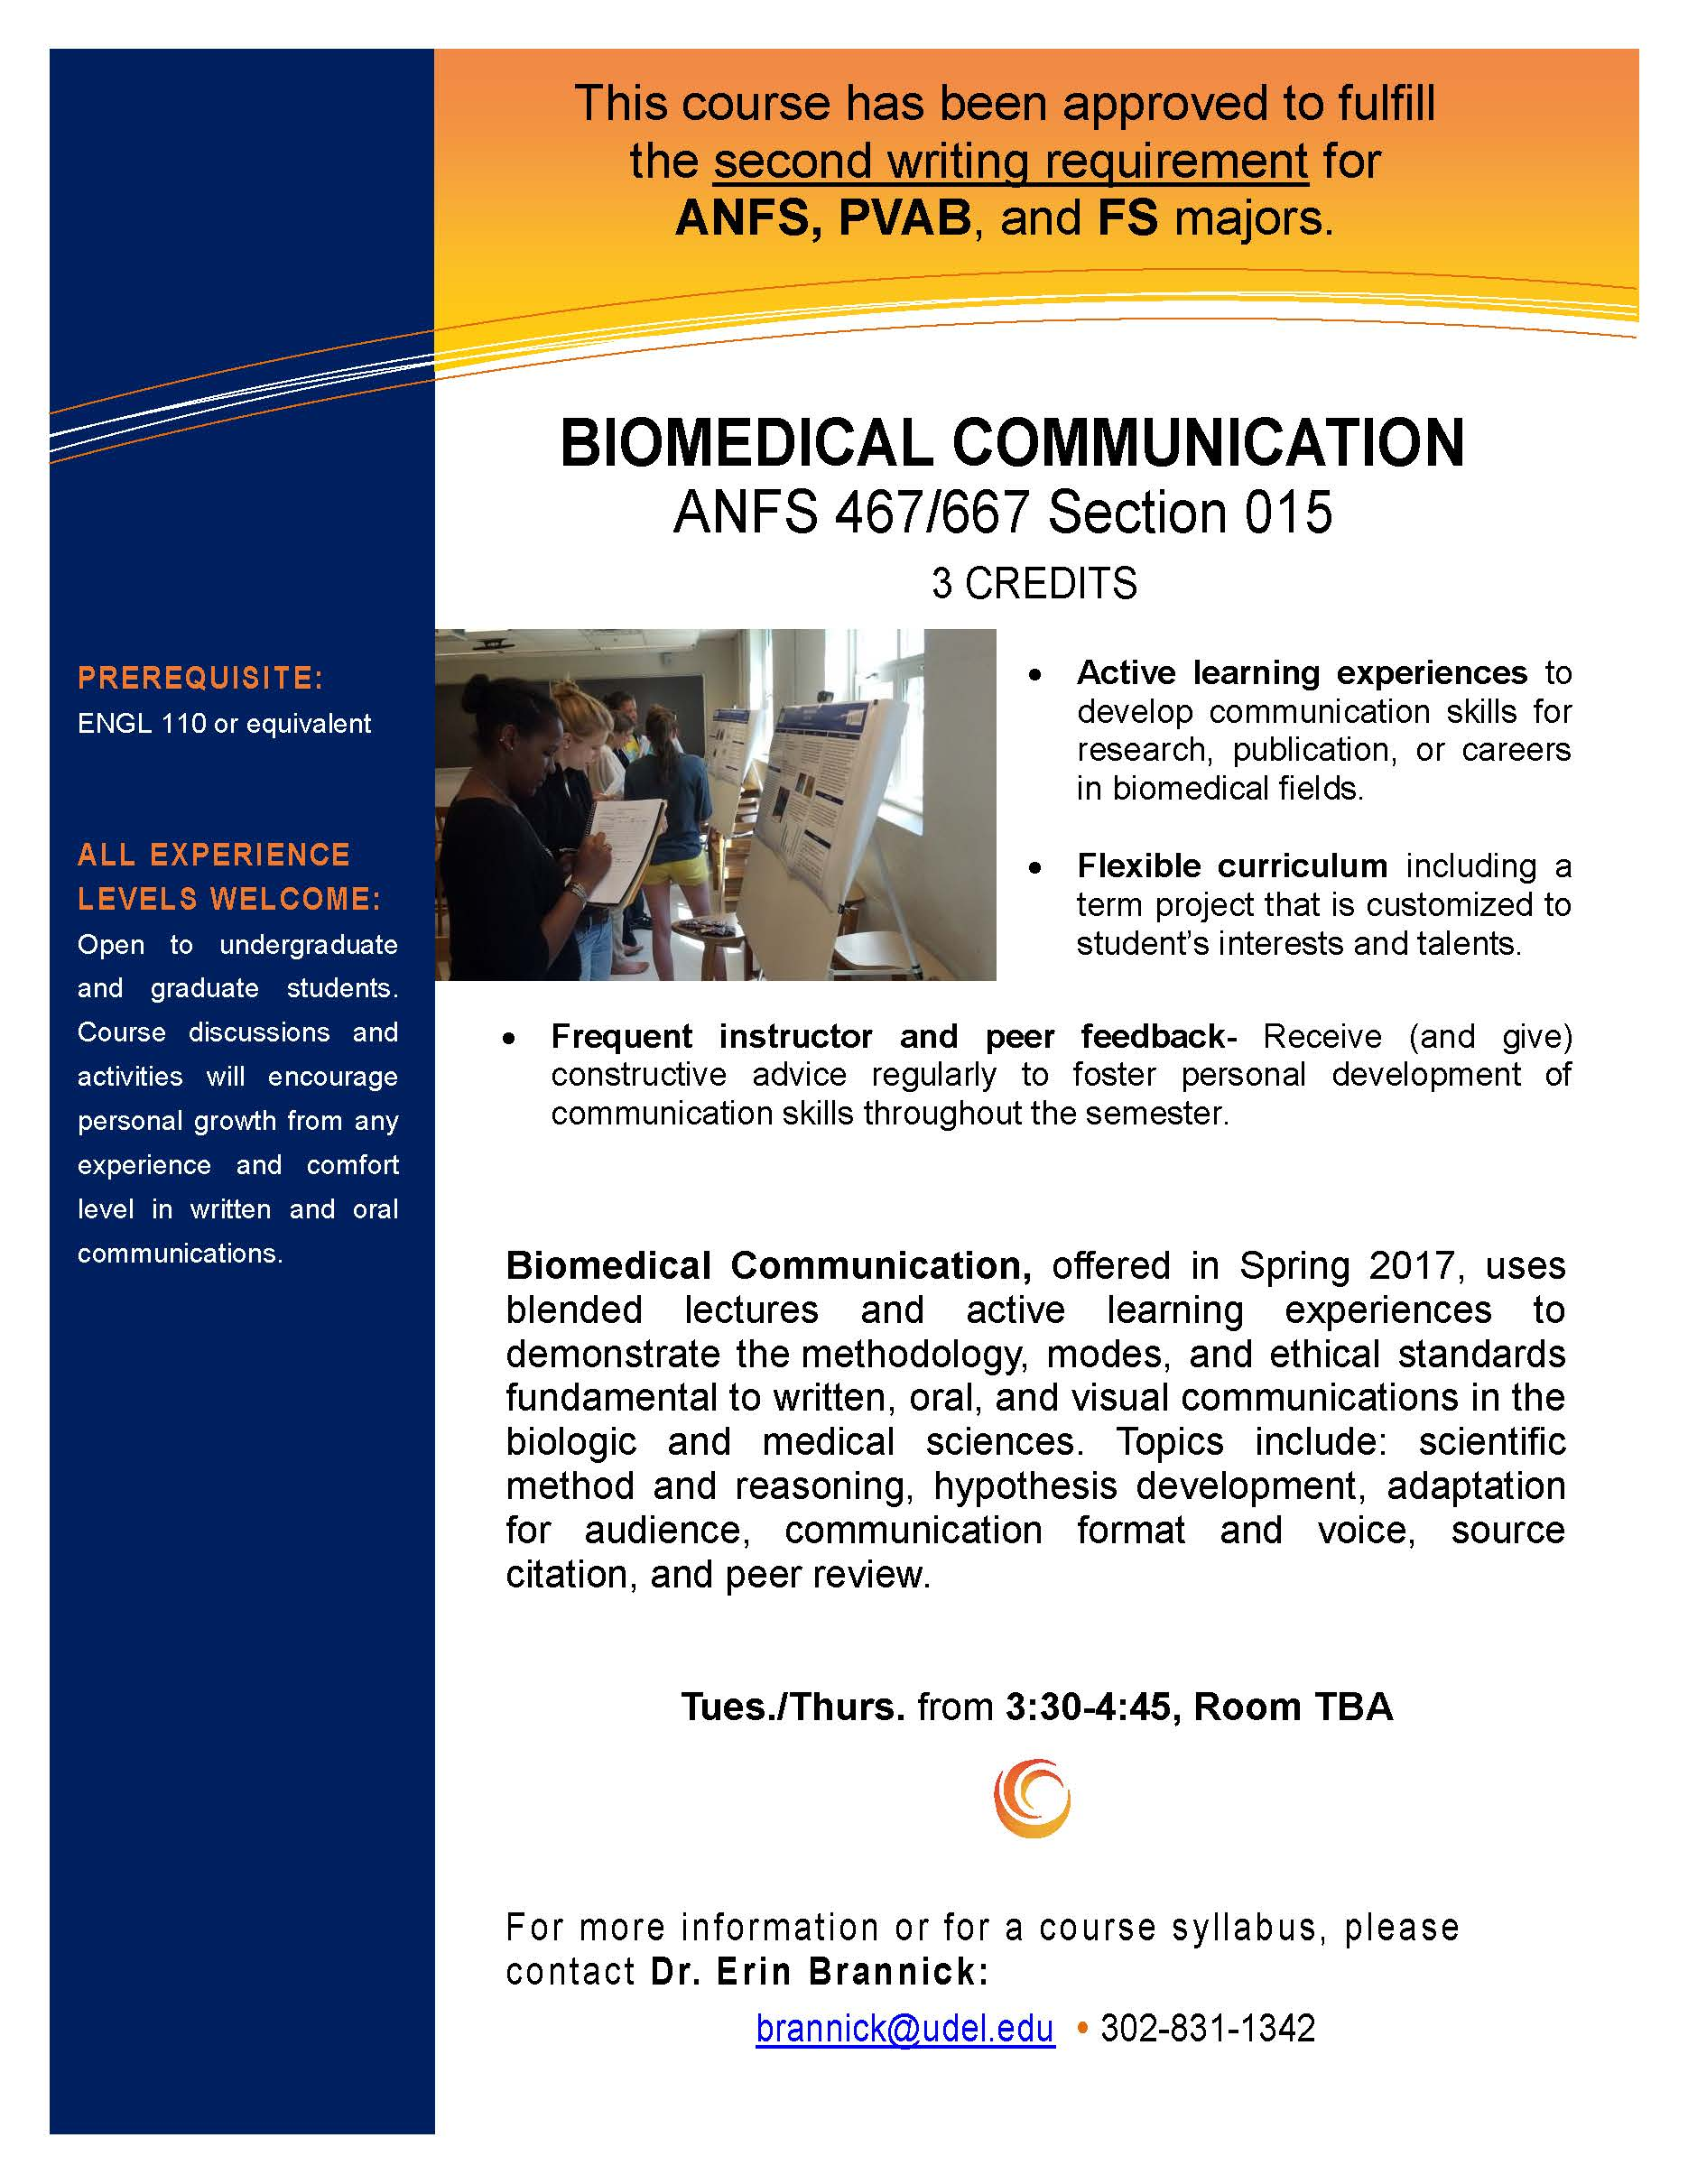 biomedical-communication-flyer-spring-2017